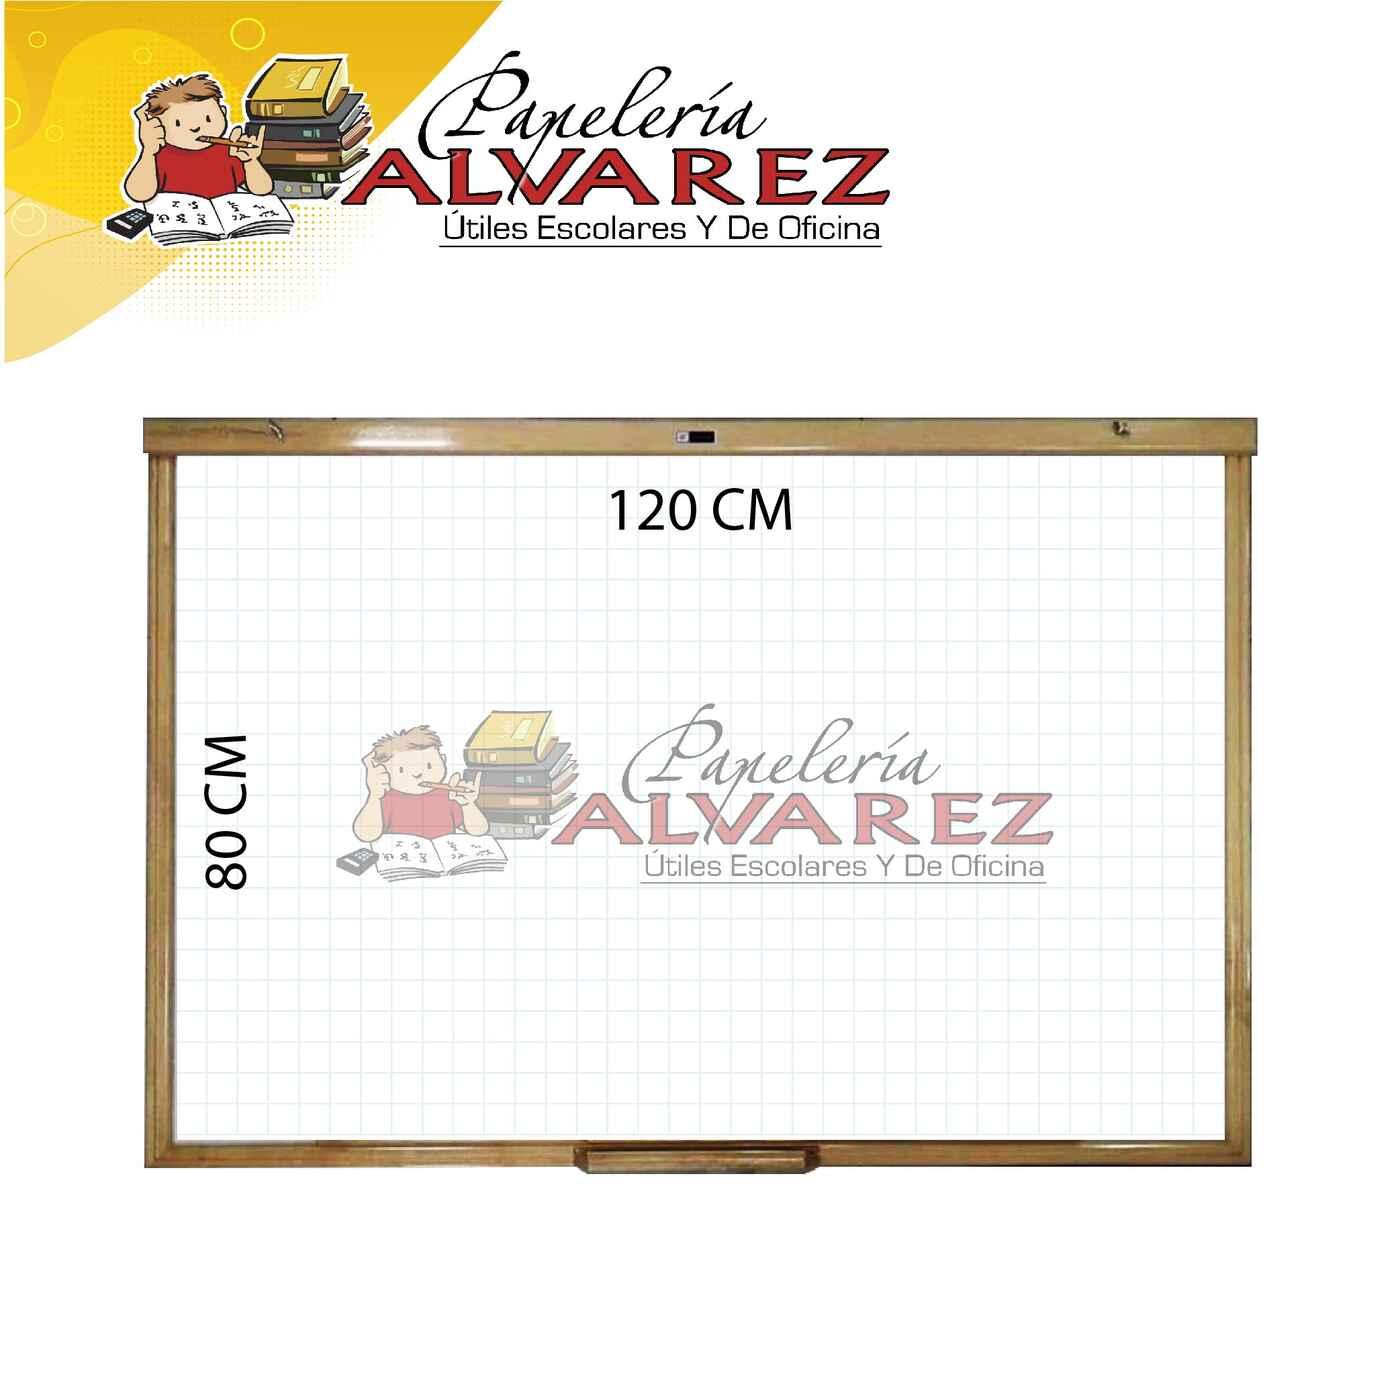 TABLERO XPRESART BLANCO BORRABLE 80X120